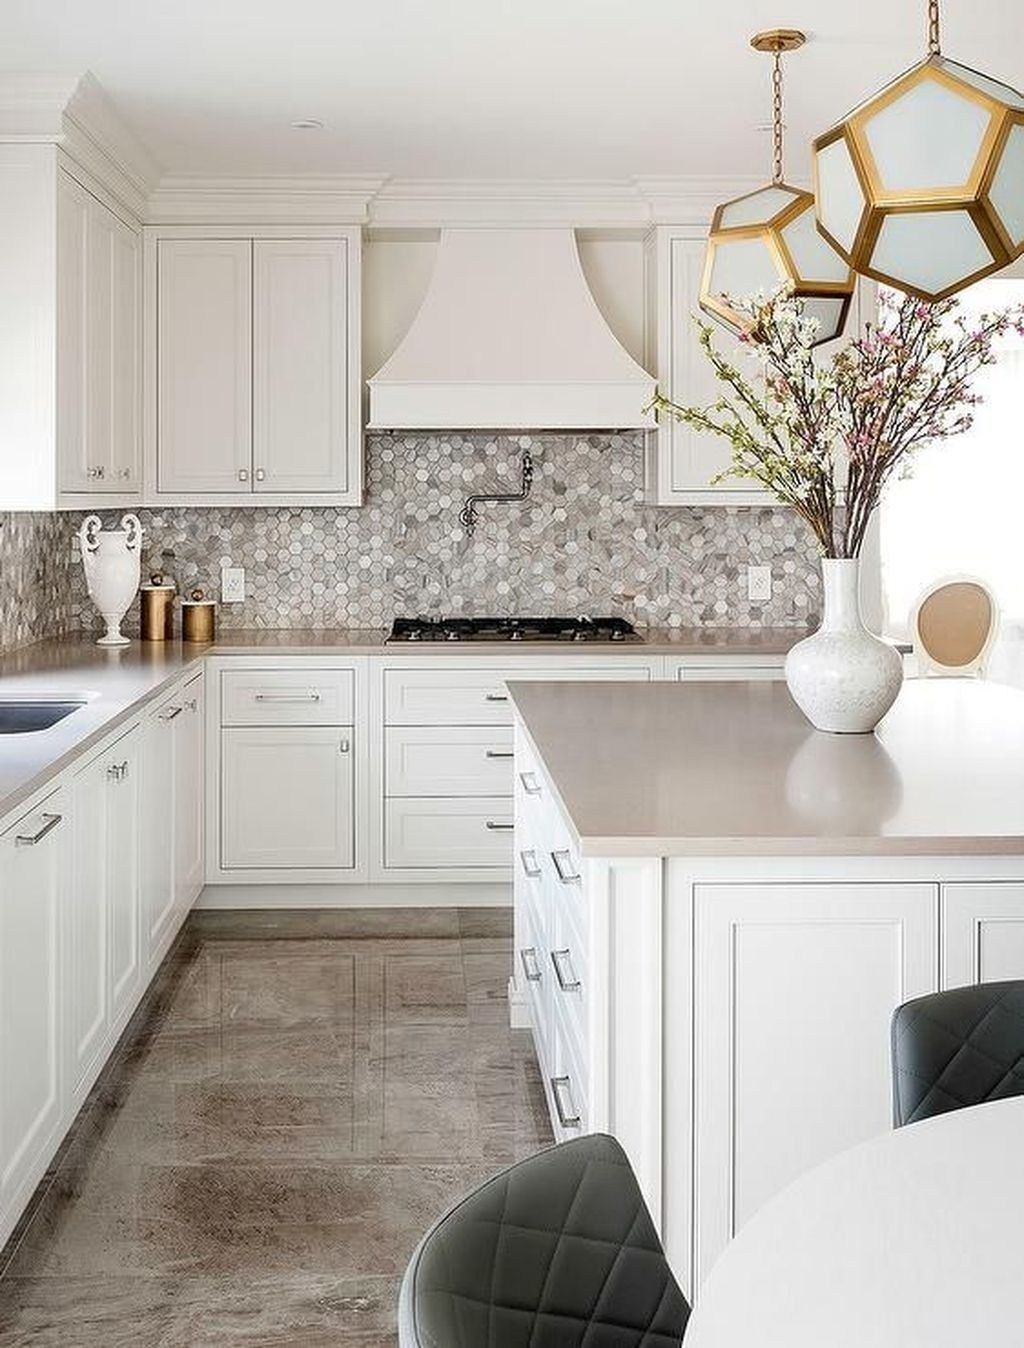 30+ Lovely White Kitchen Backsplash Design Ideas With ...